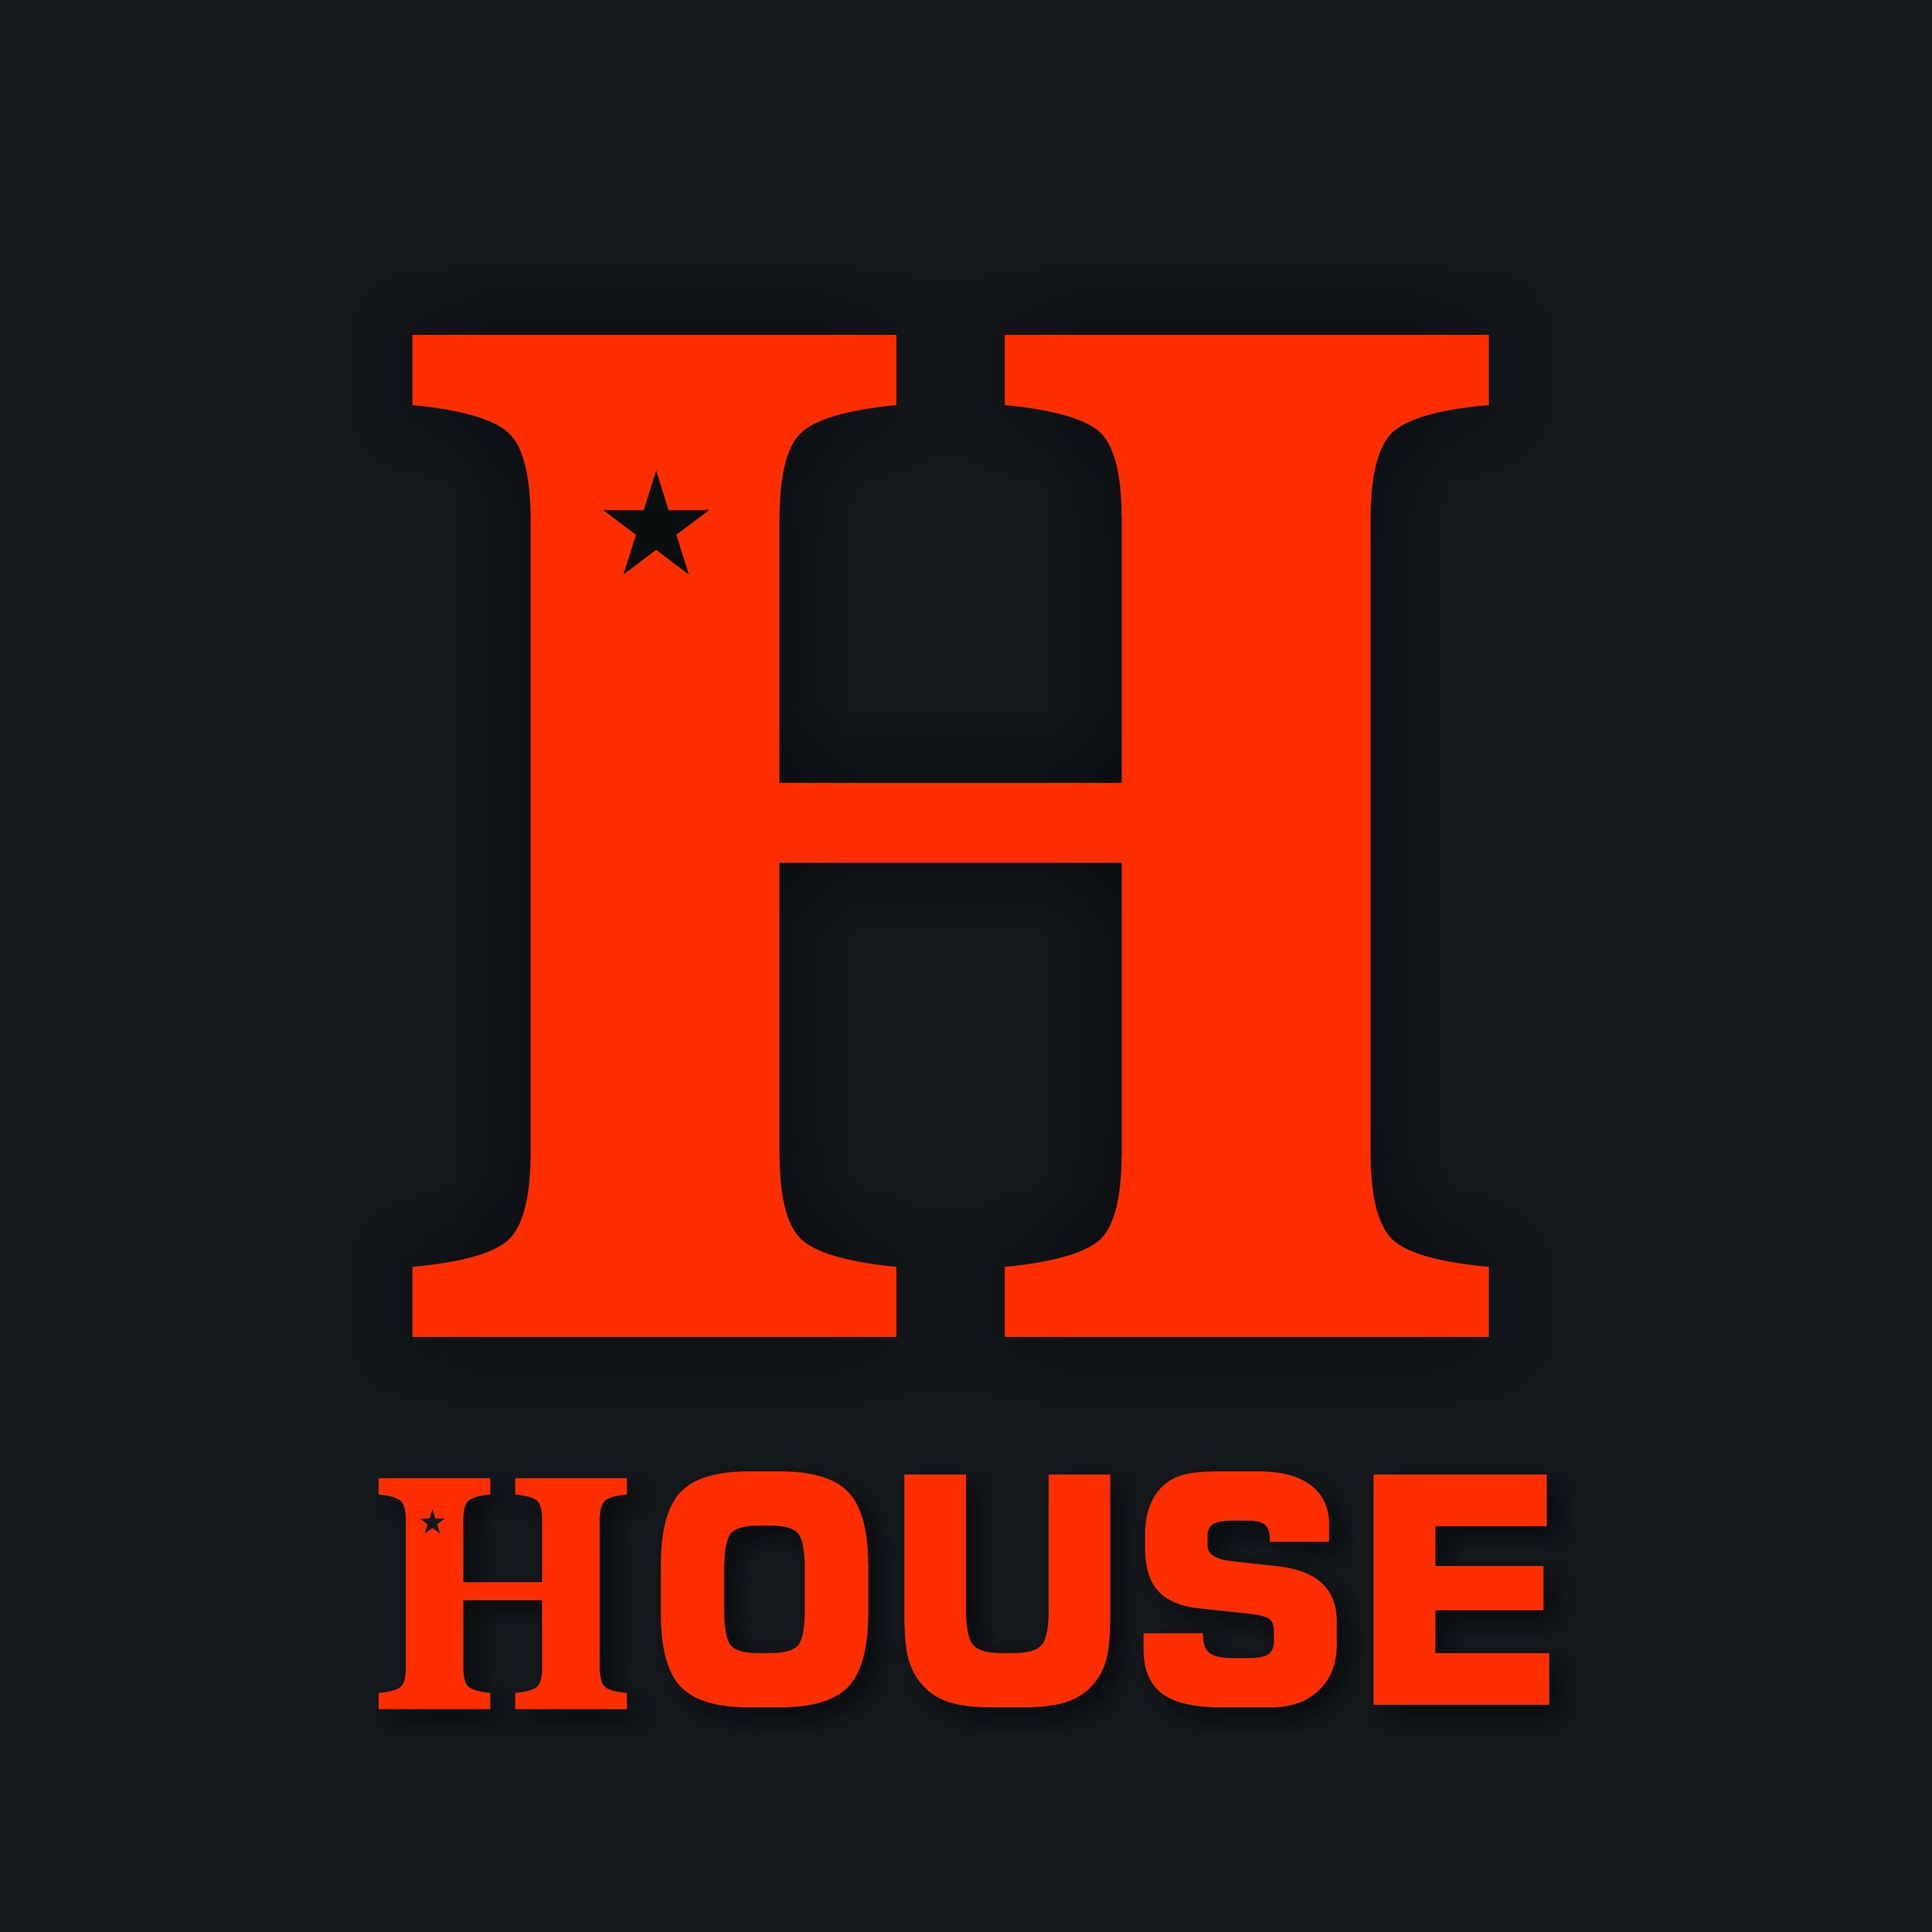 House Hamburgueria